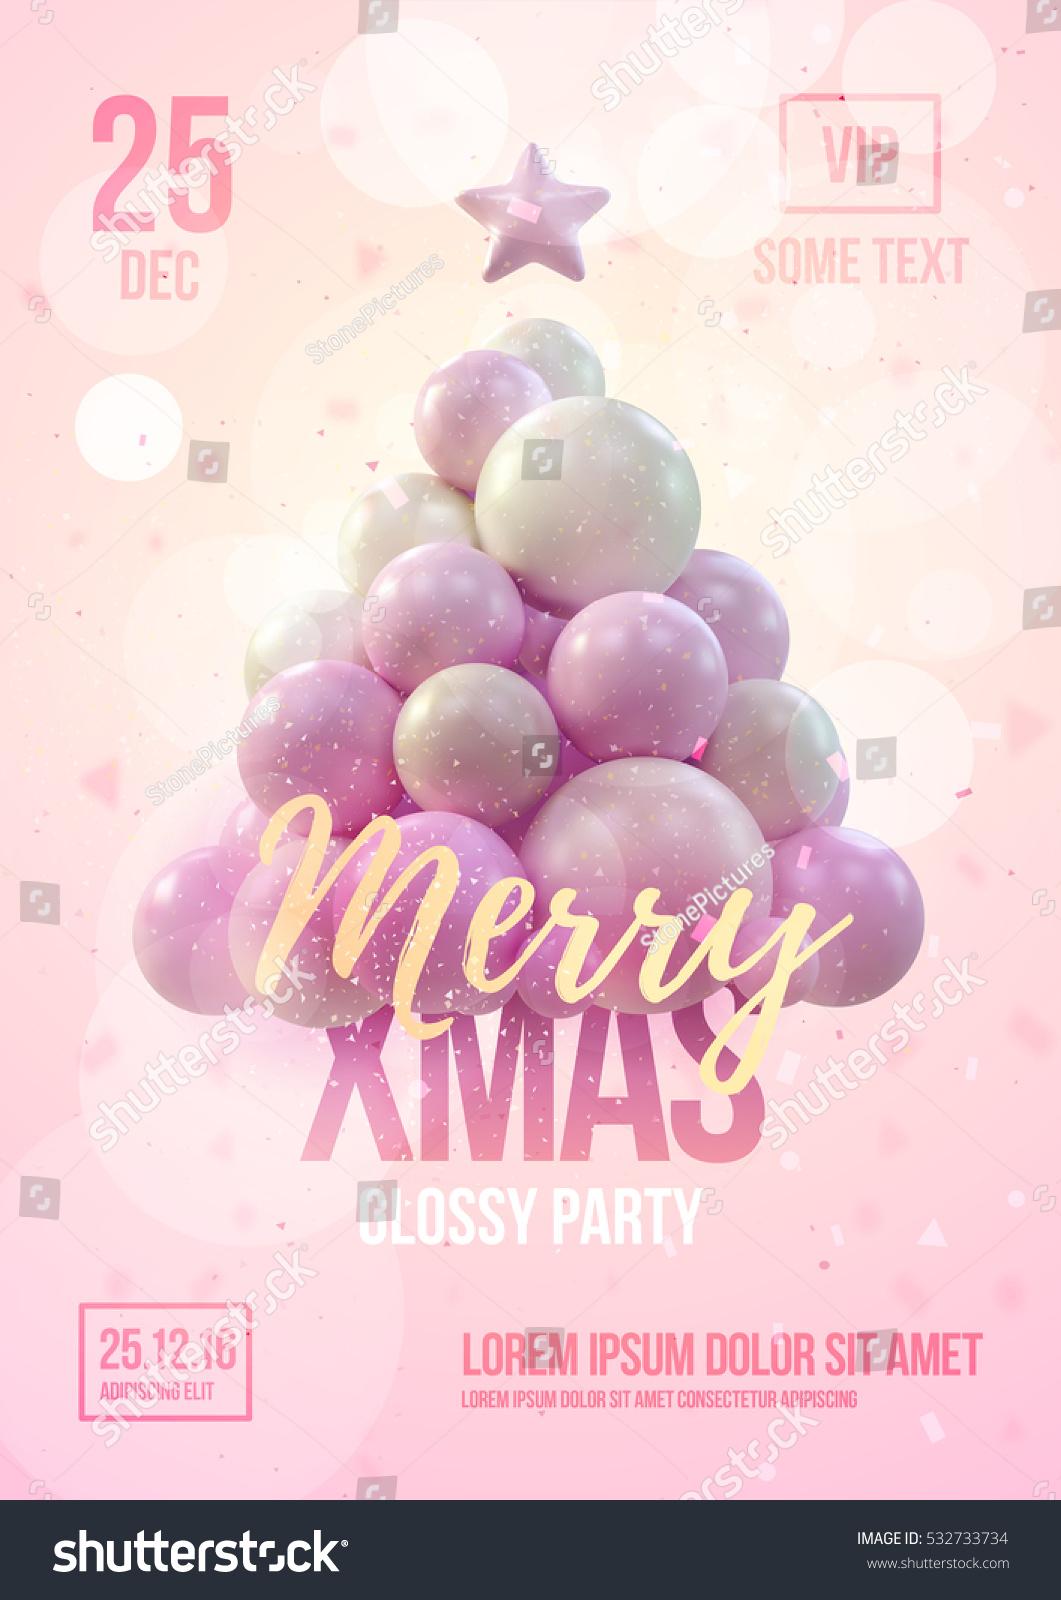 Christmas Poster Flyer Template Pink Christmas Stock Vector Royalty